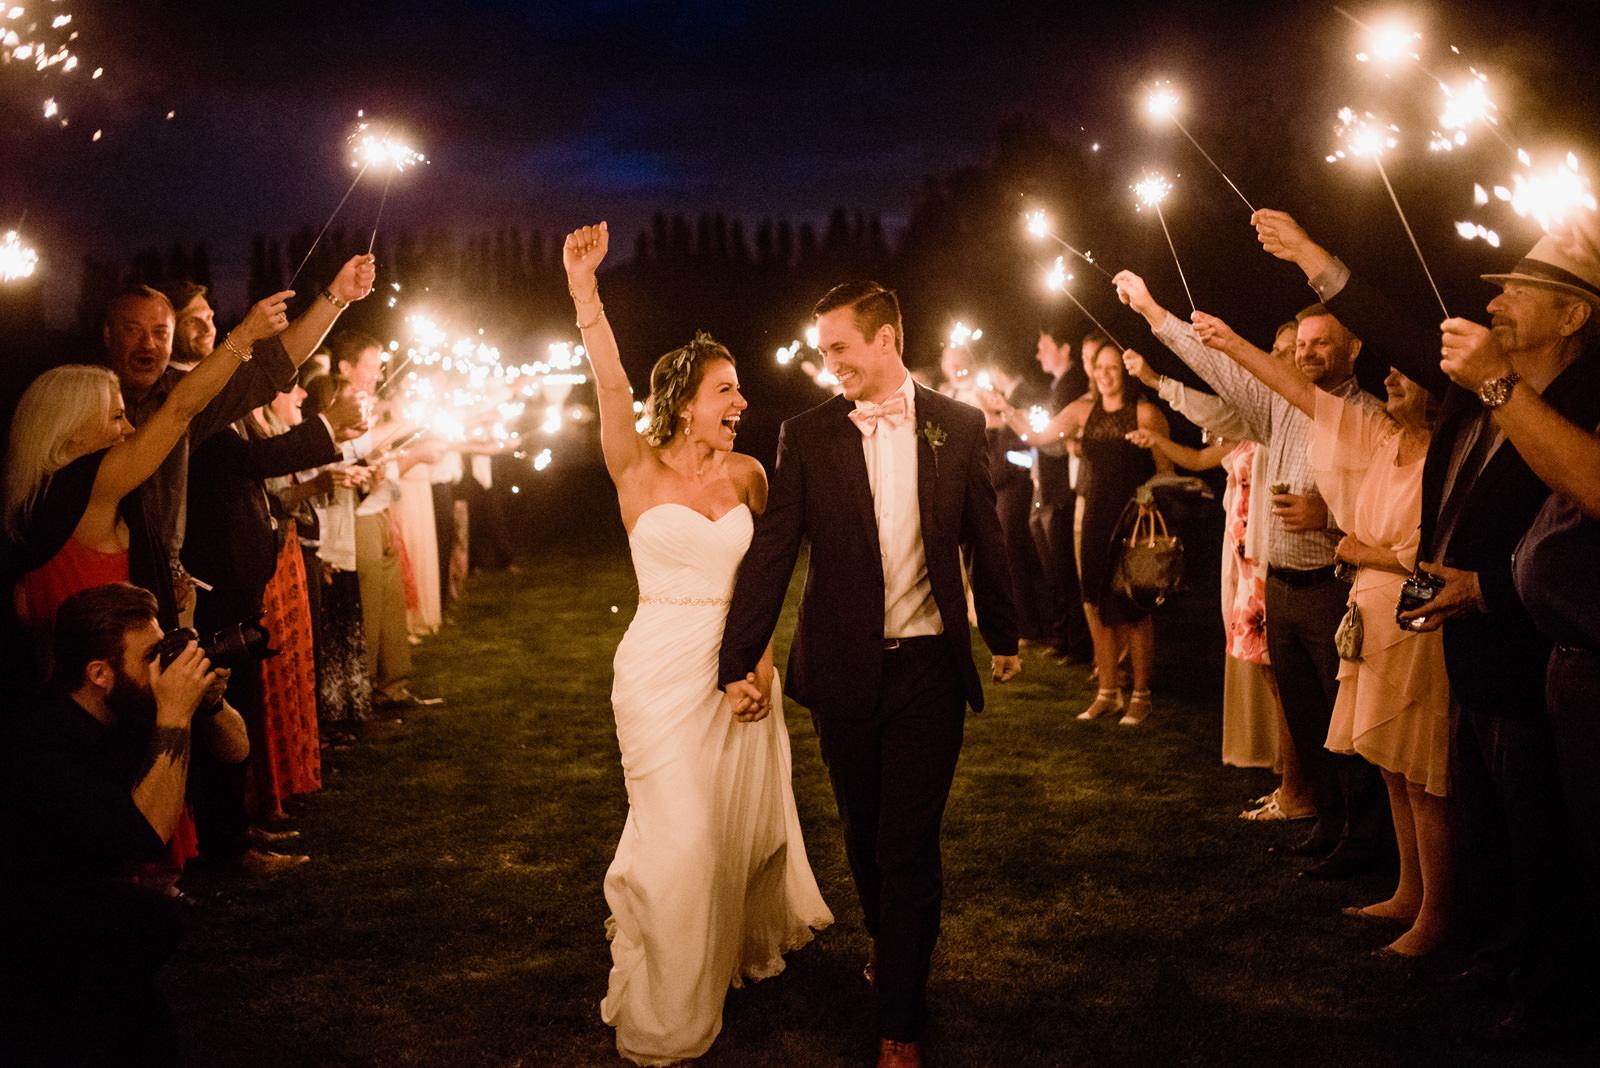 113-woodinville-lavendar-farm-wedding-with-golden-glowy-photos.jpg